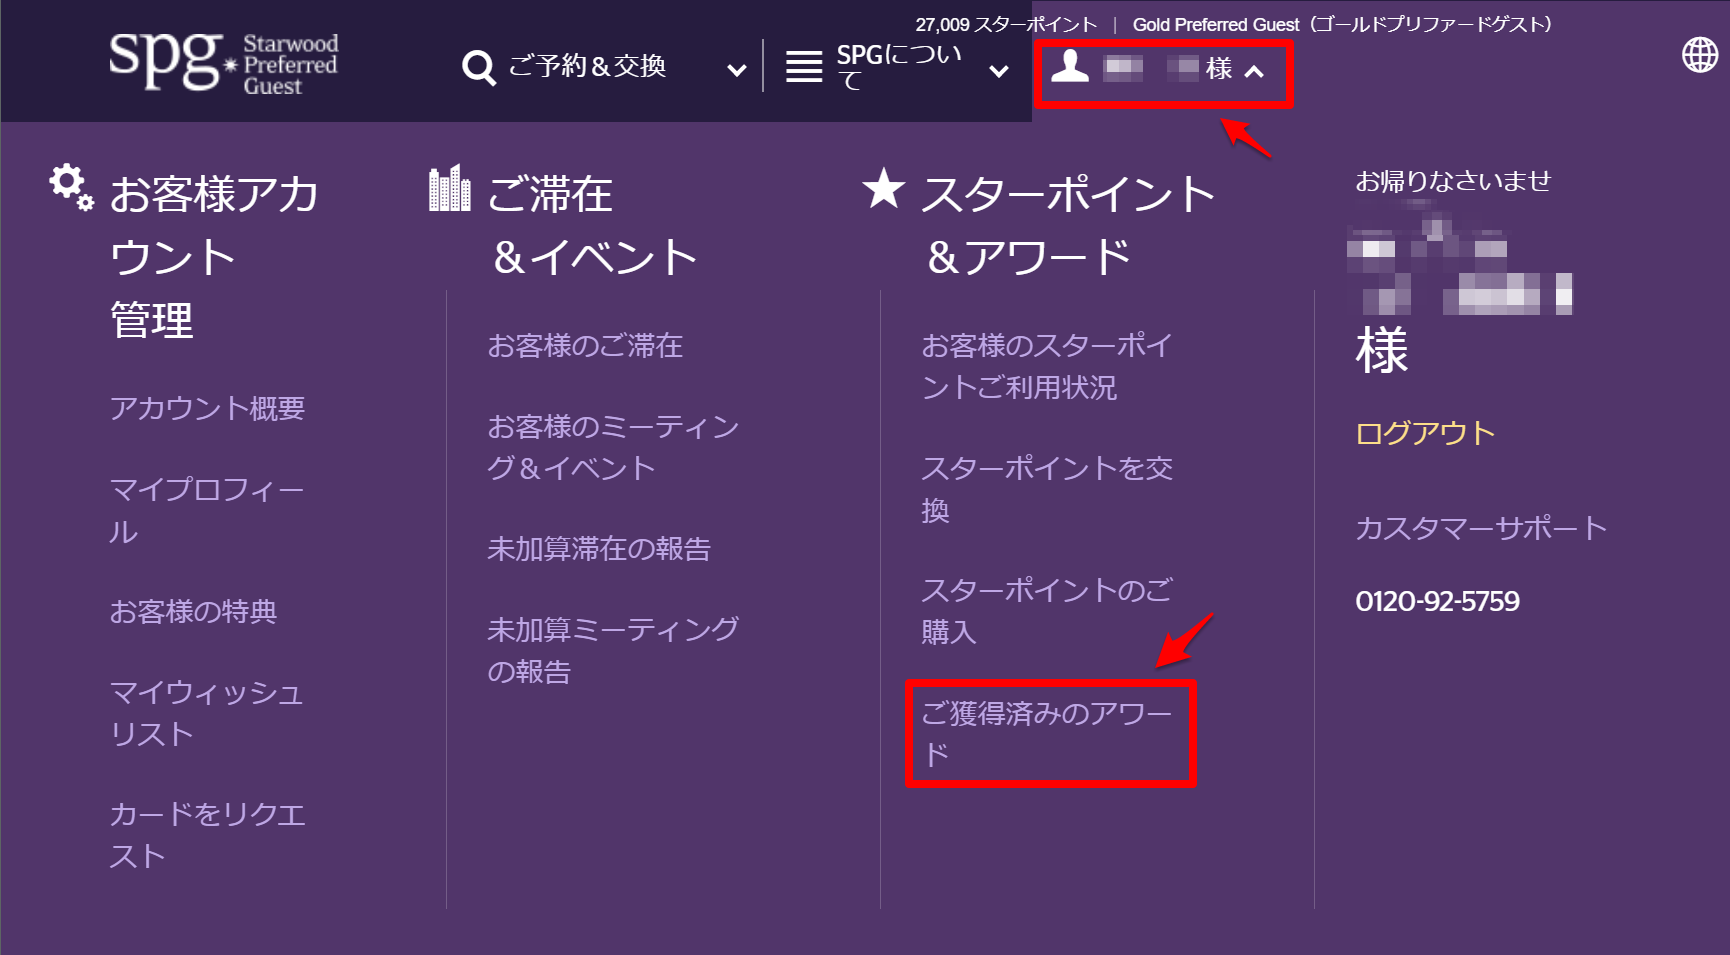 spgアメックス 更新特典01